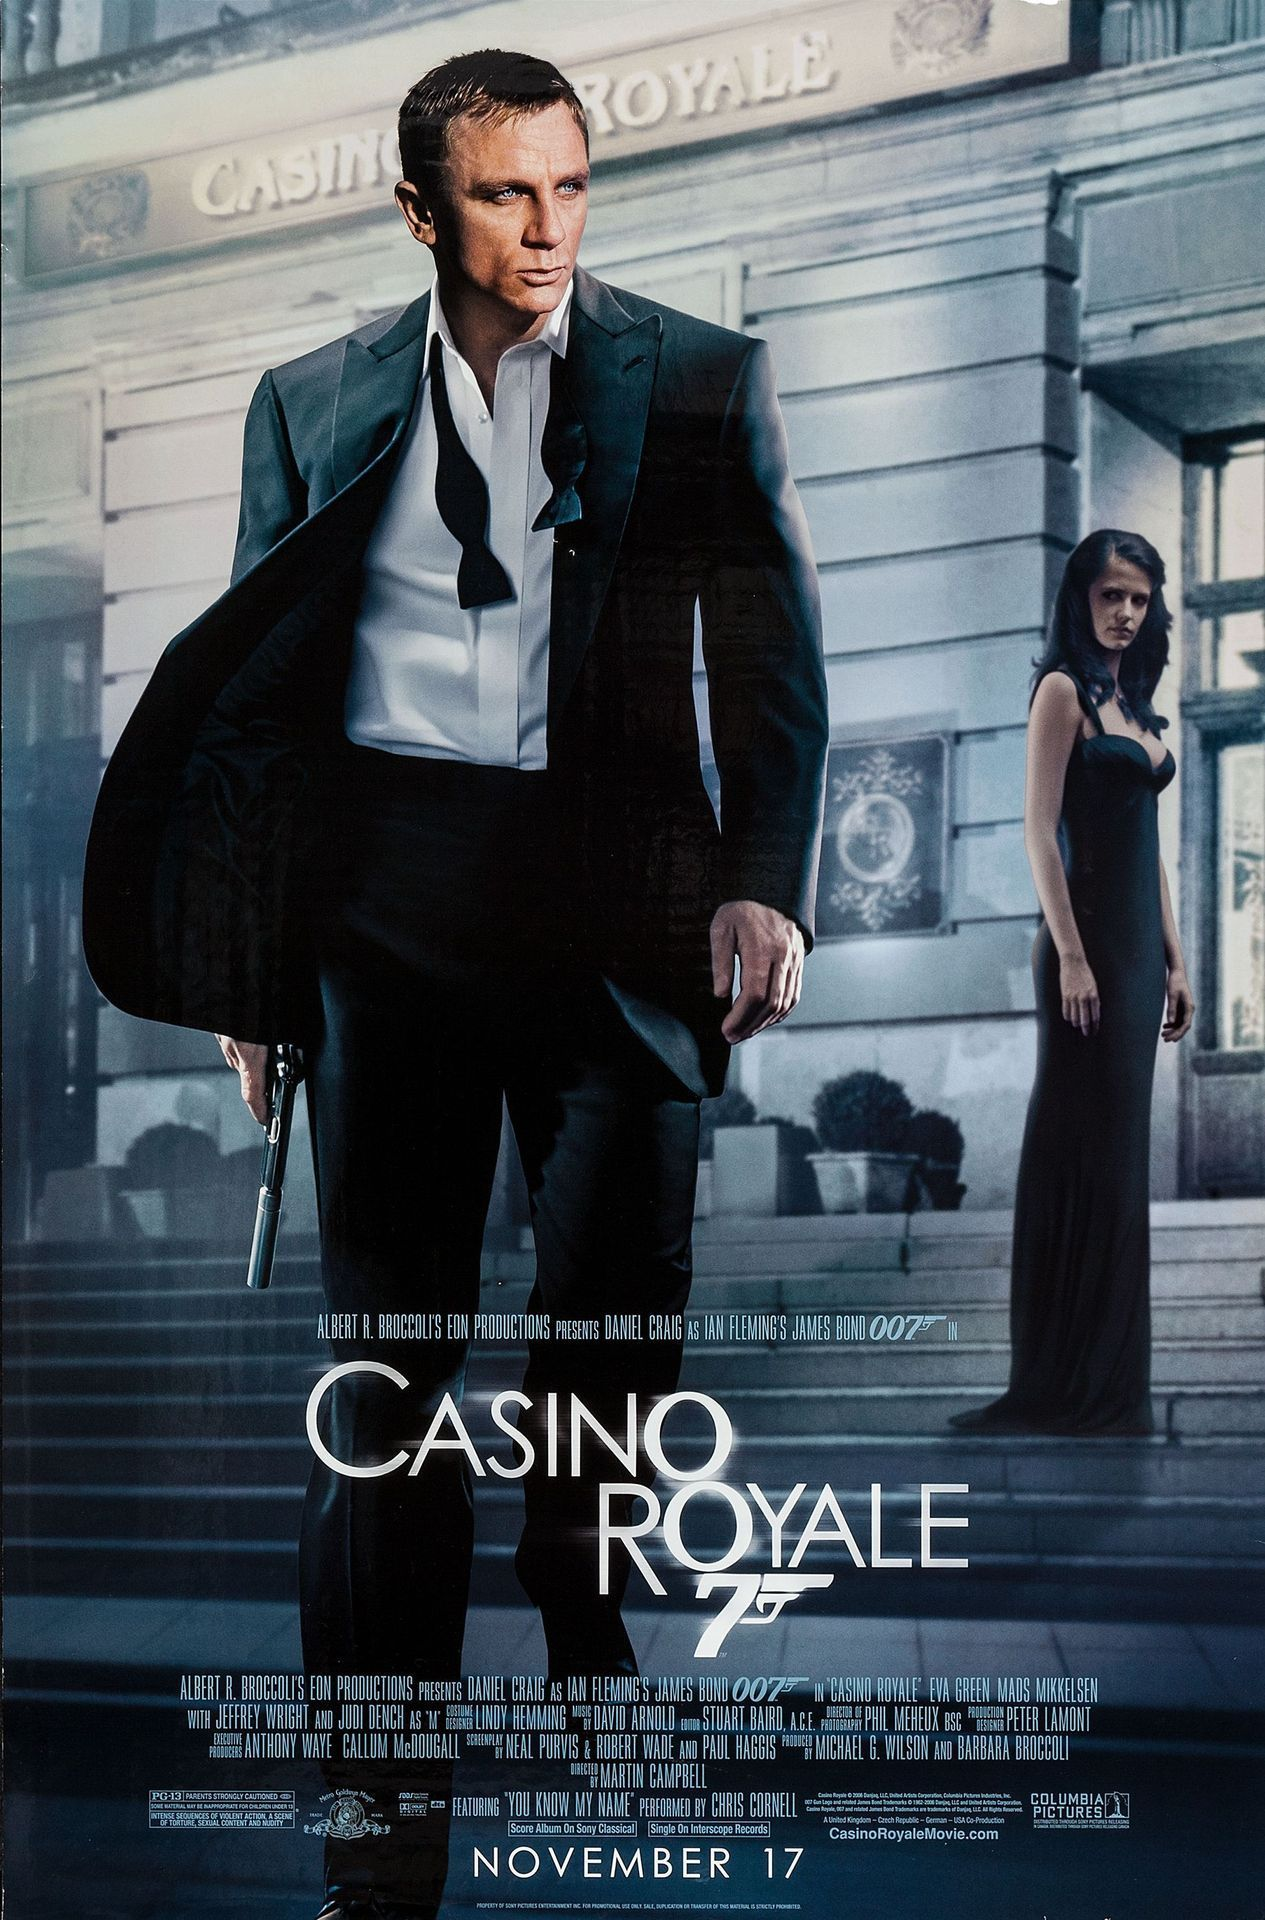 Sala66 Peliculas De James Bond 007 Casino Royale Peliculas